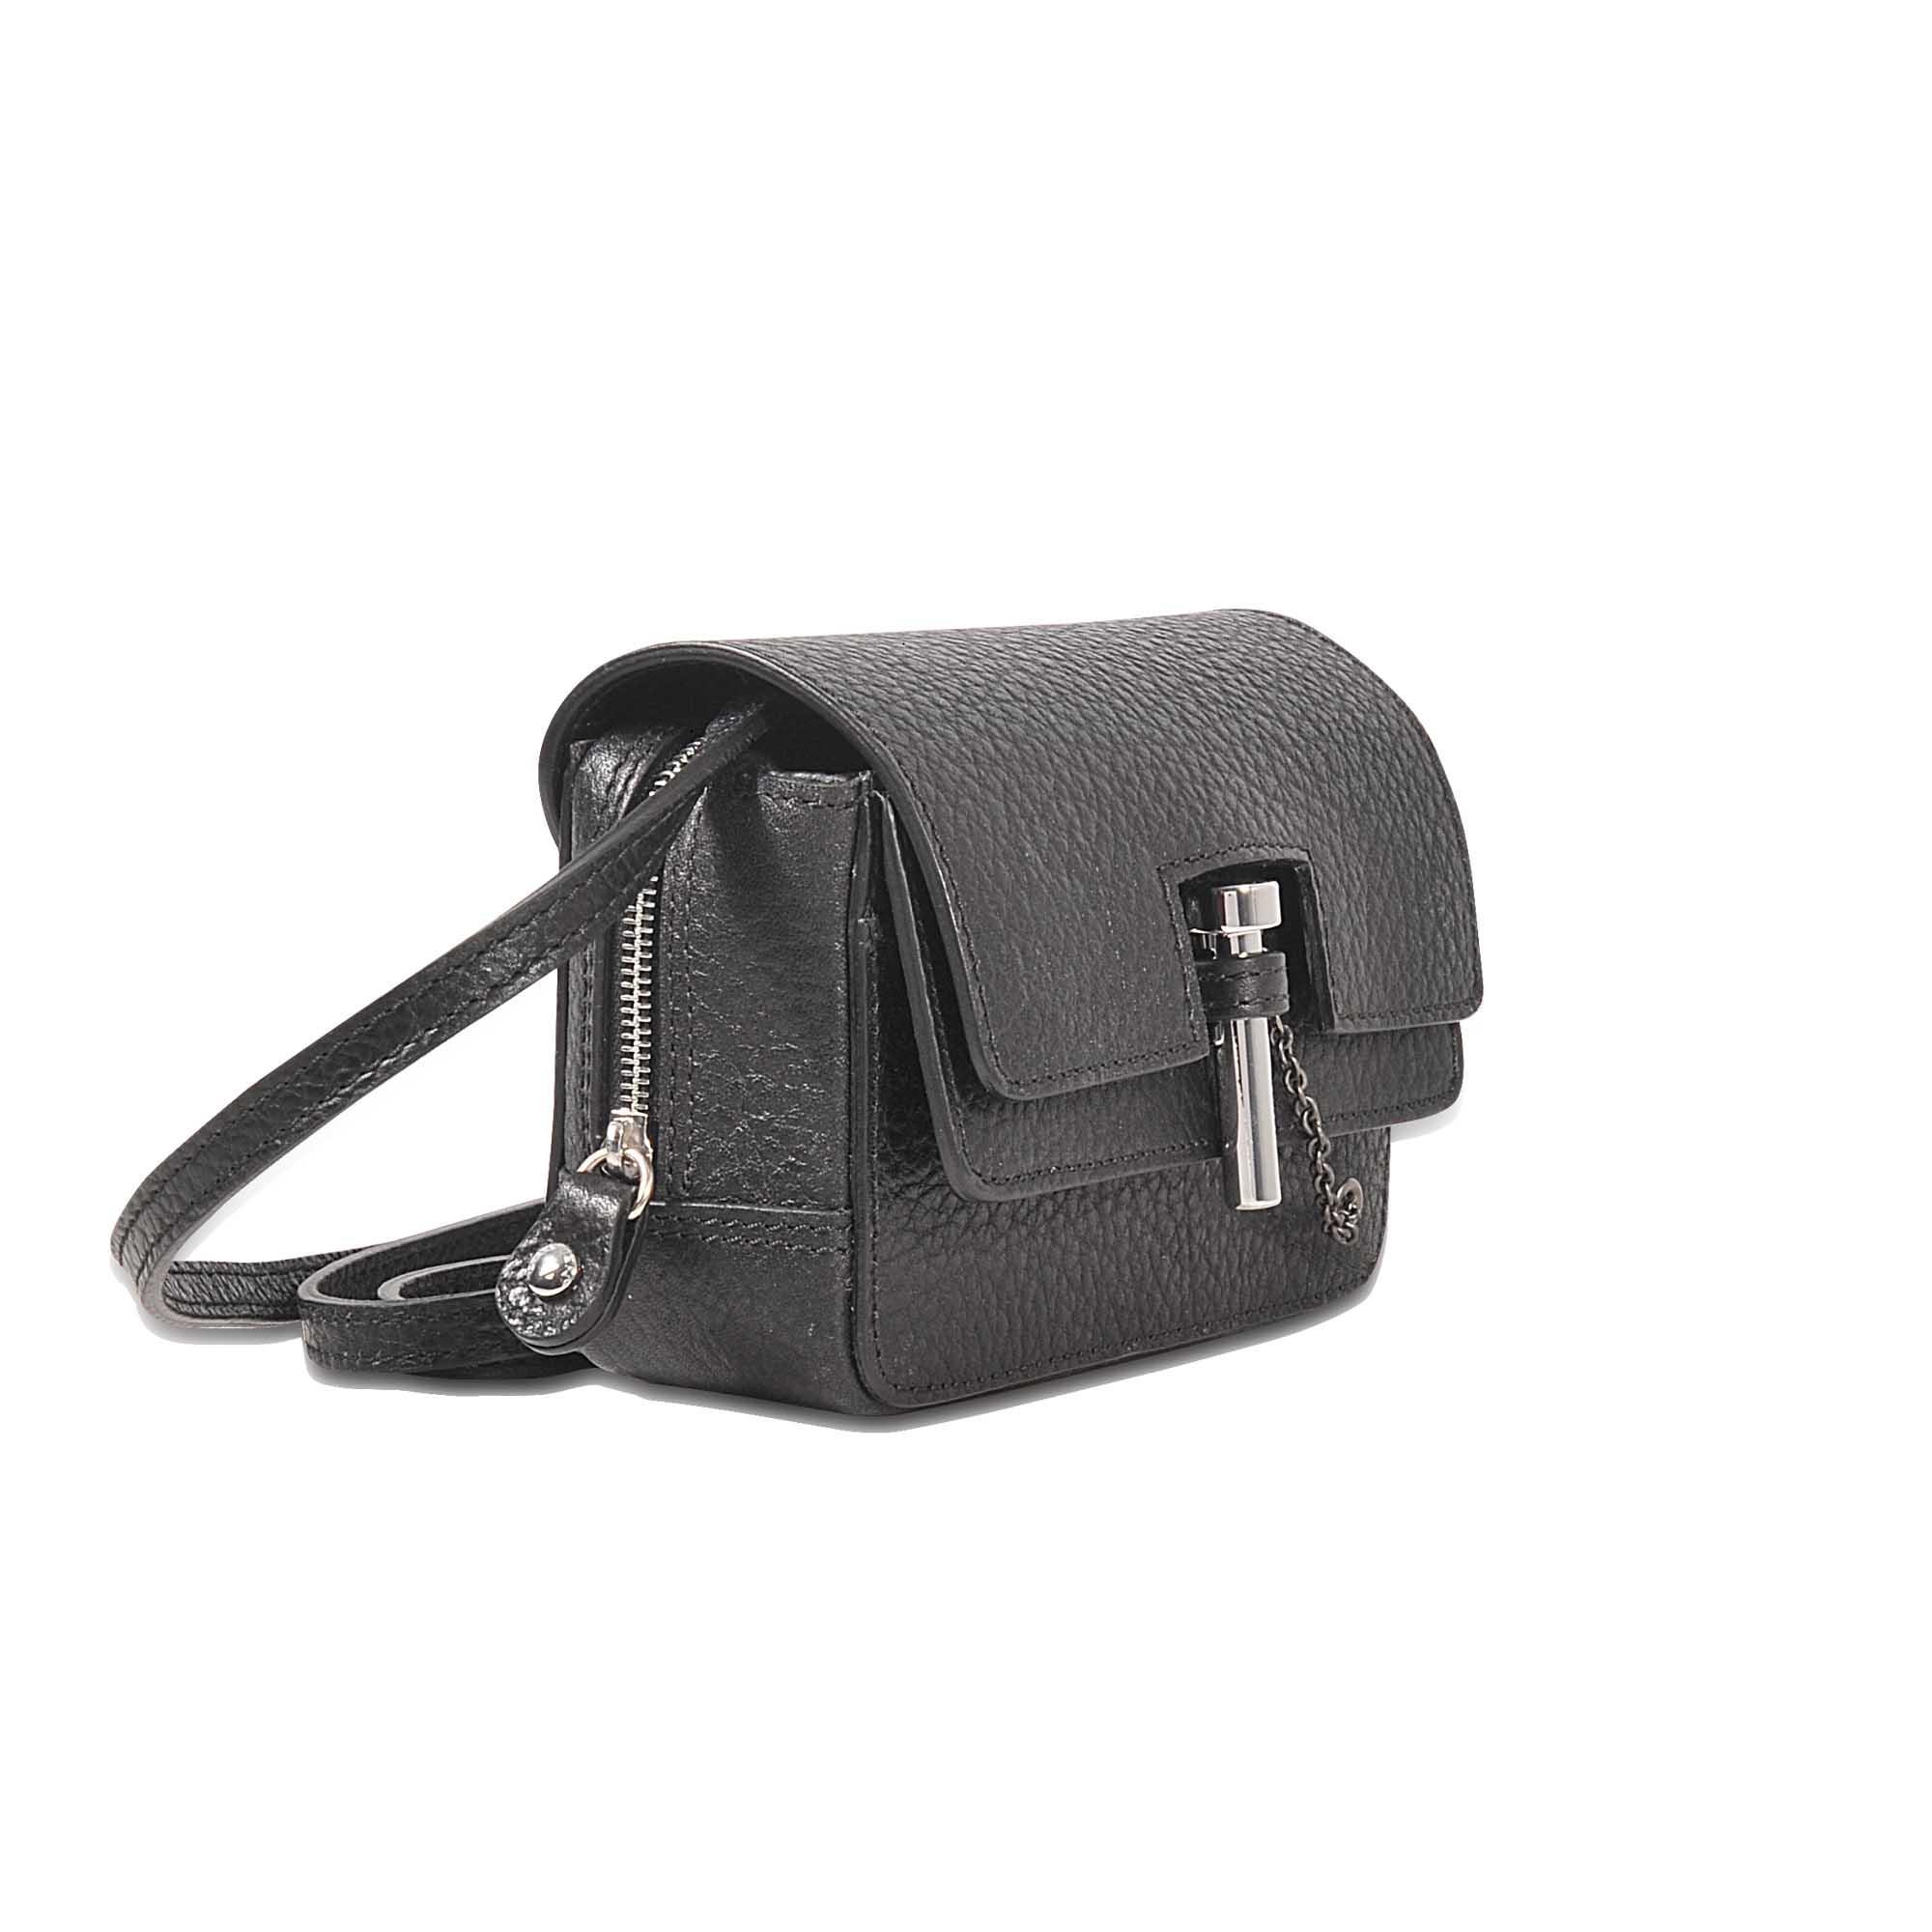 c5998f81f4 Lyst - Carven Mahler Mini Bag in Black